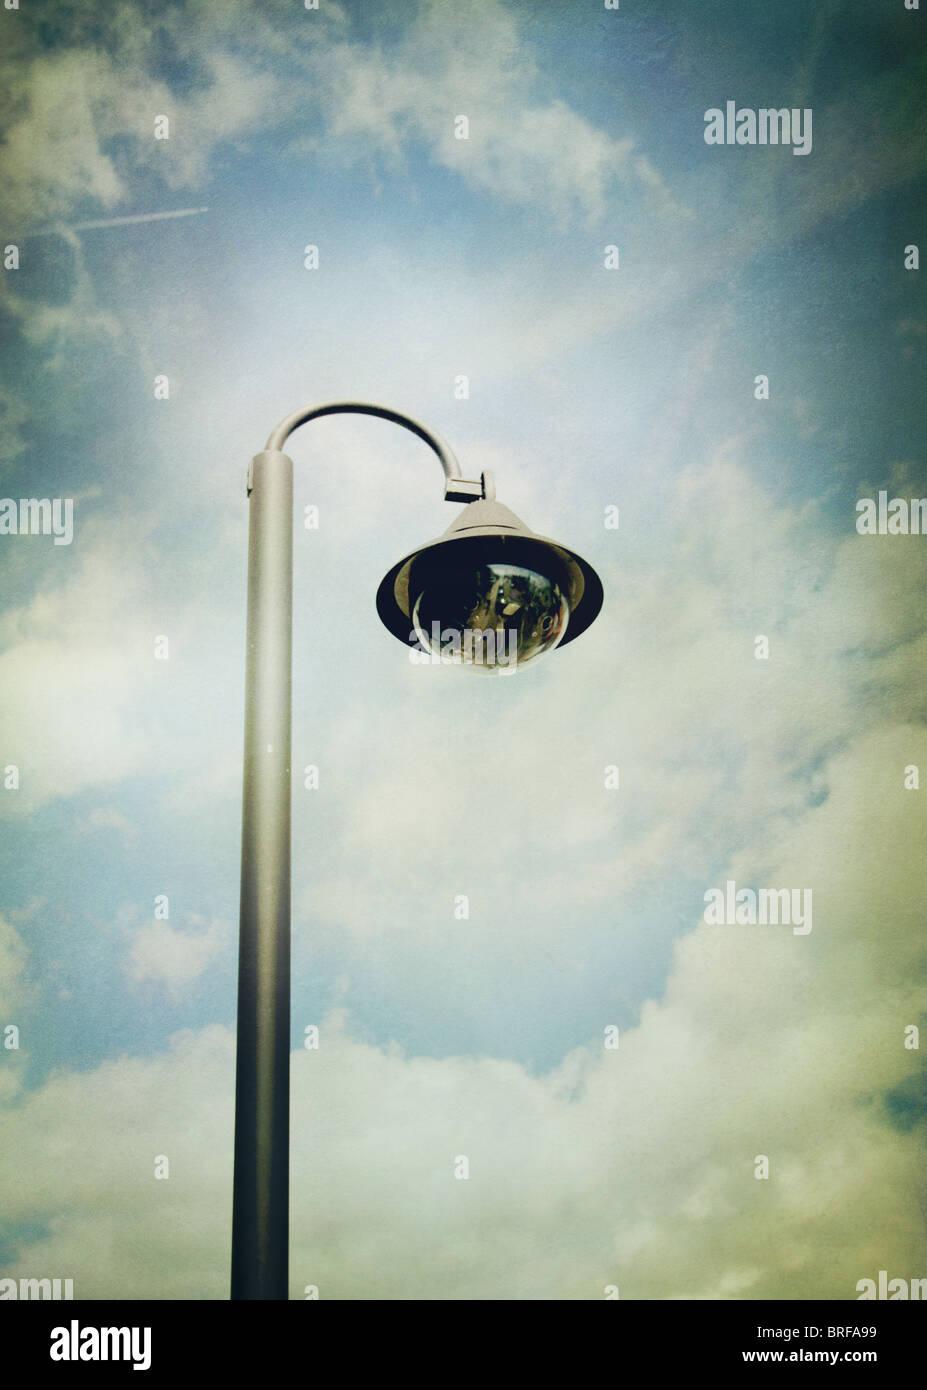 security camera - Stock Image